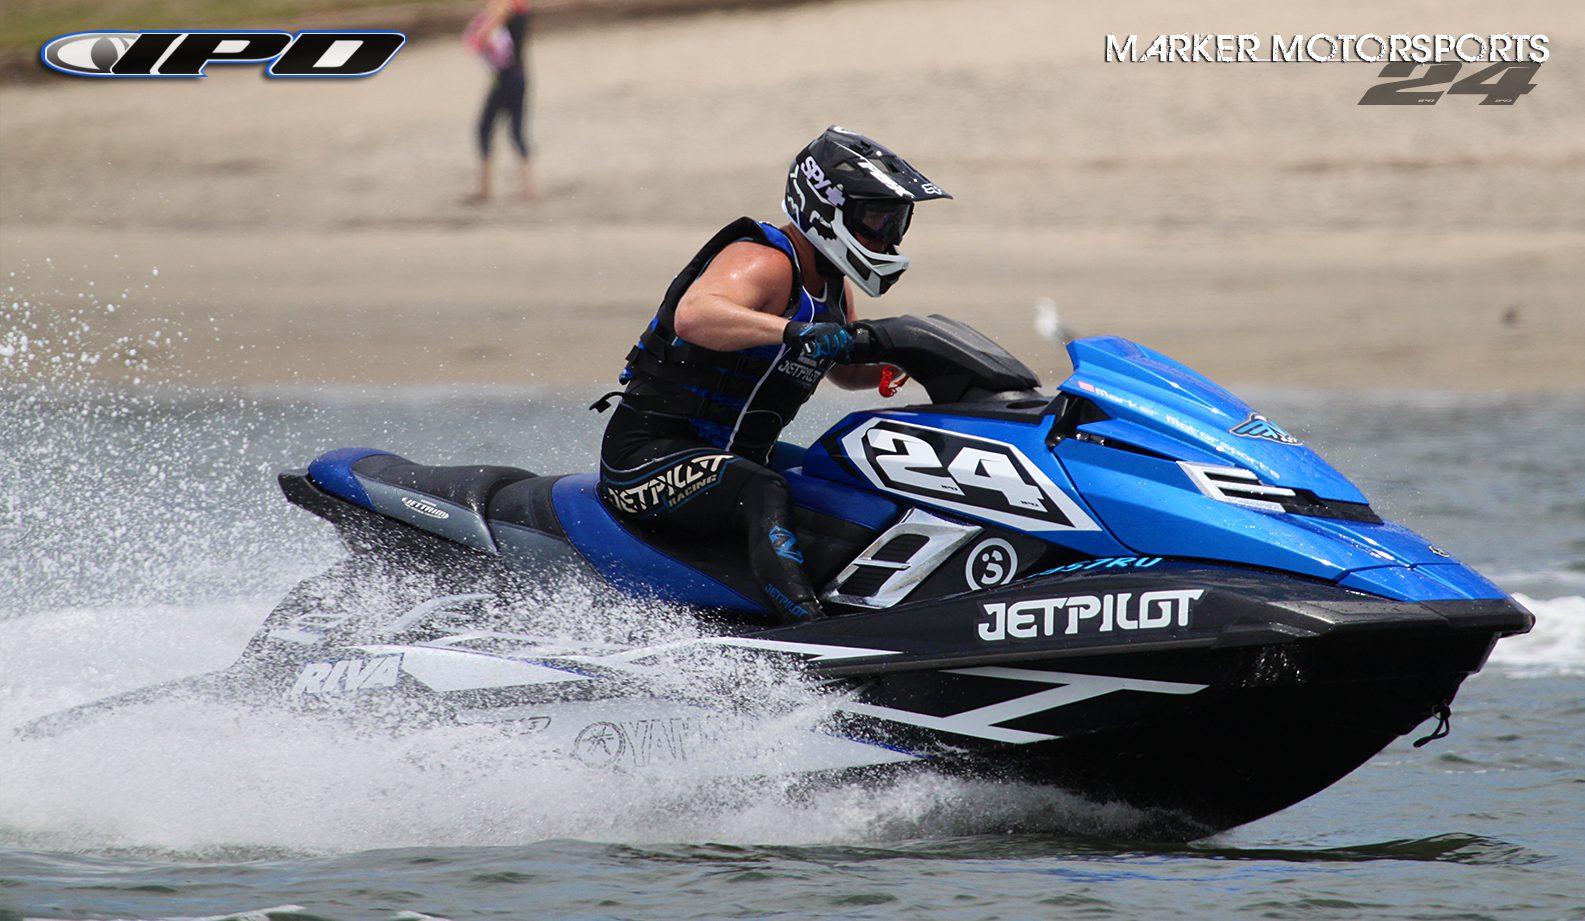 GK-STB-FXSHO2 installed on Marker Motorsport's FX SVHO